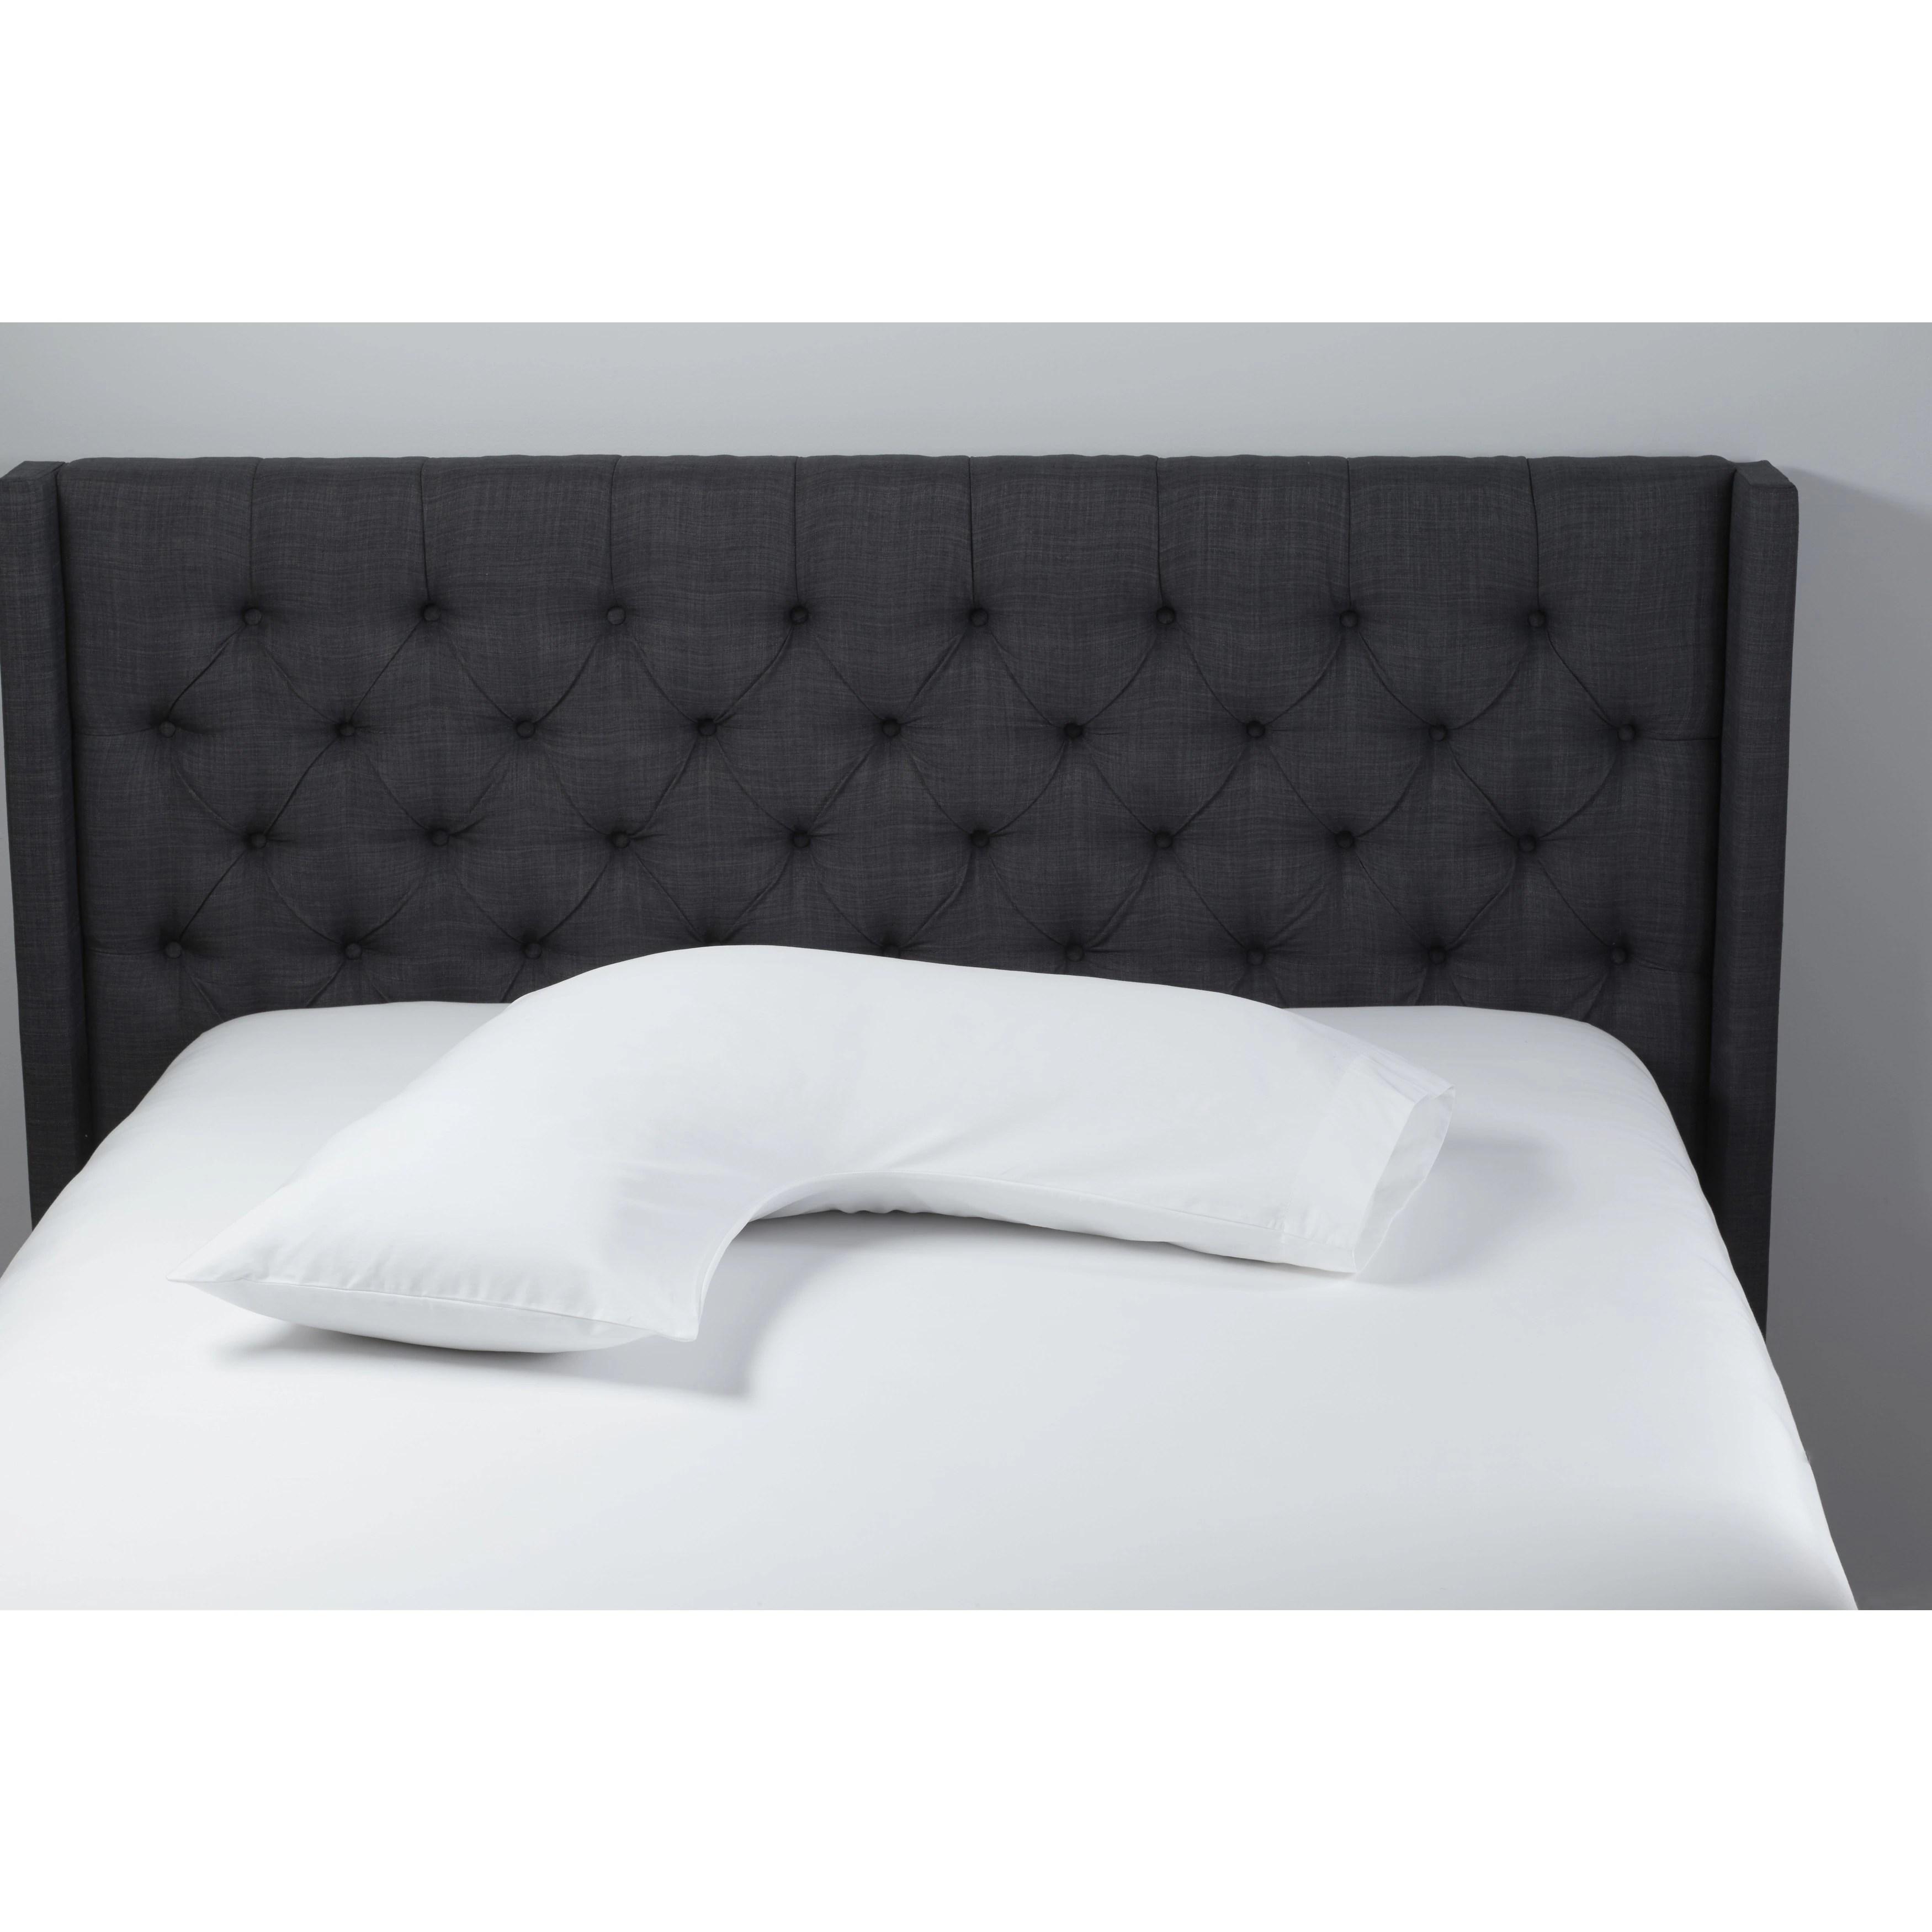 beautyrest boomerang shaped lite loft body pillow white